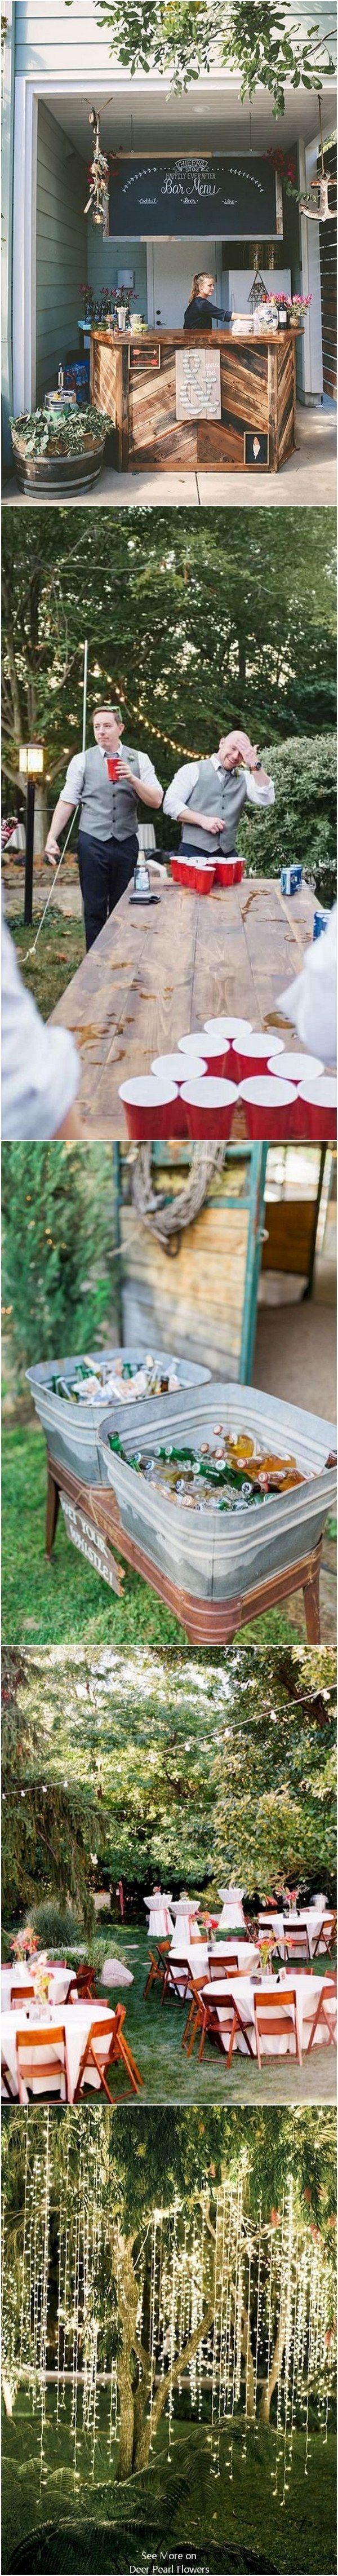 Intimate Backyard Outdoor Wedding Decor Ideas #backyardwedding #outdoorwedding #countrywedding #weddingdecor  ❤️http://www.deerpearlflowers.com/intimate-backyard-outdoor-wedding-ideas/ #outdoorweddingdecorations